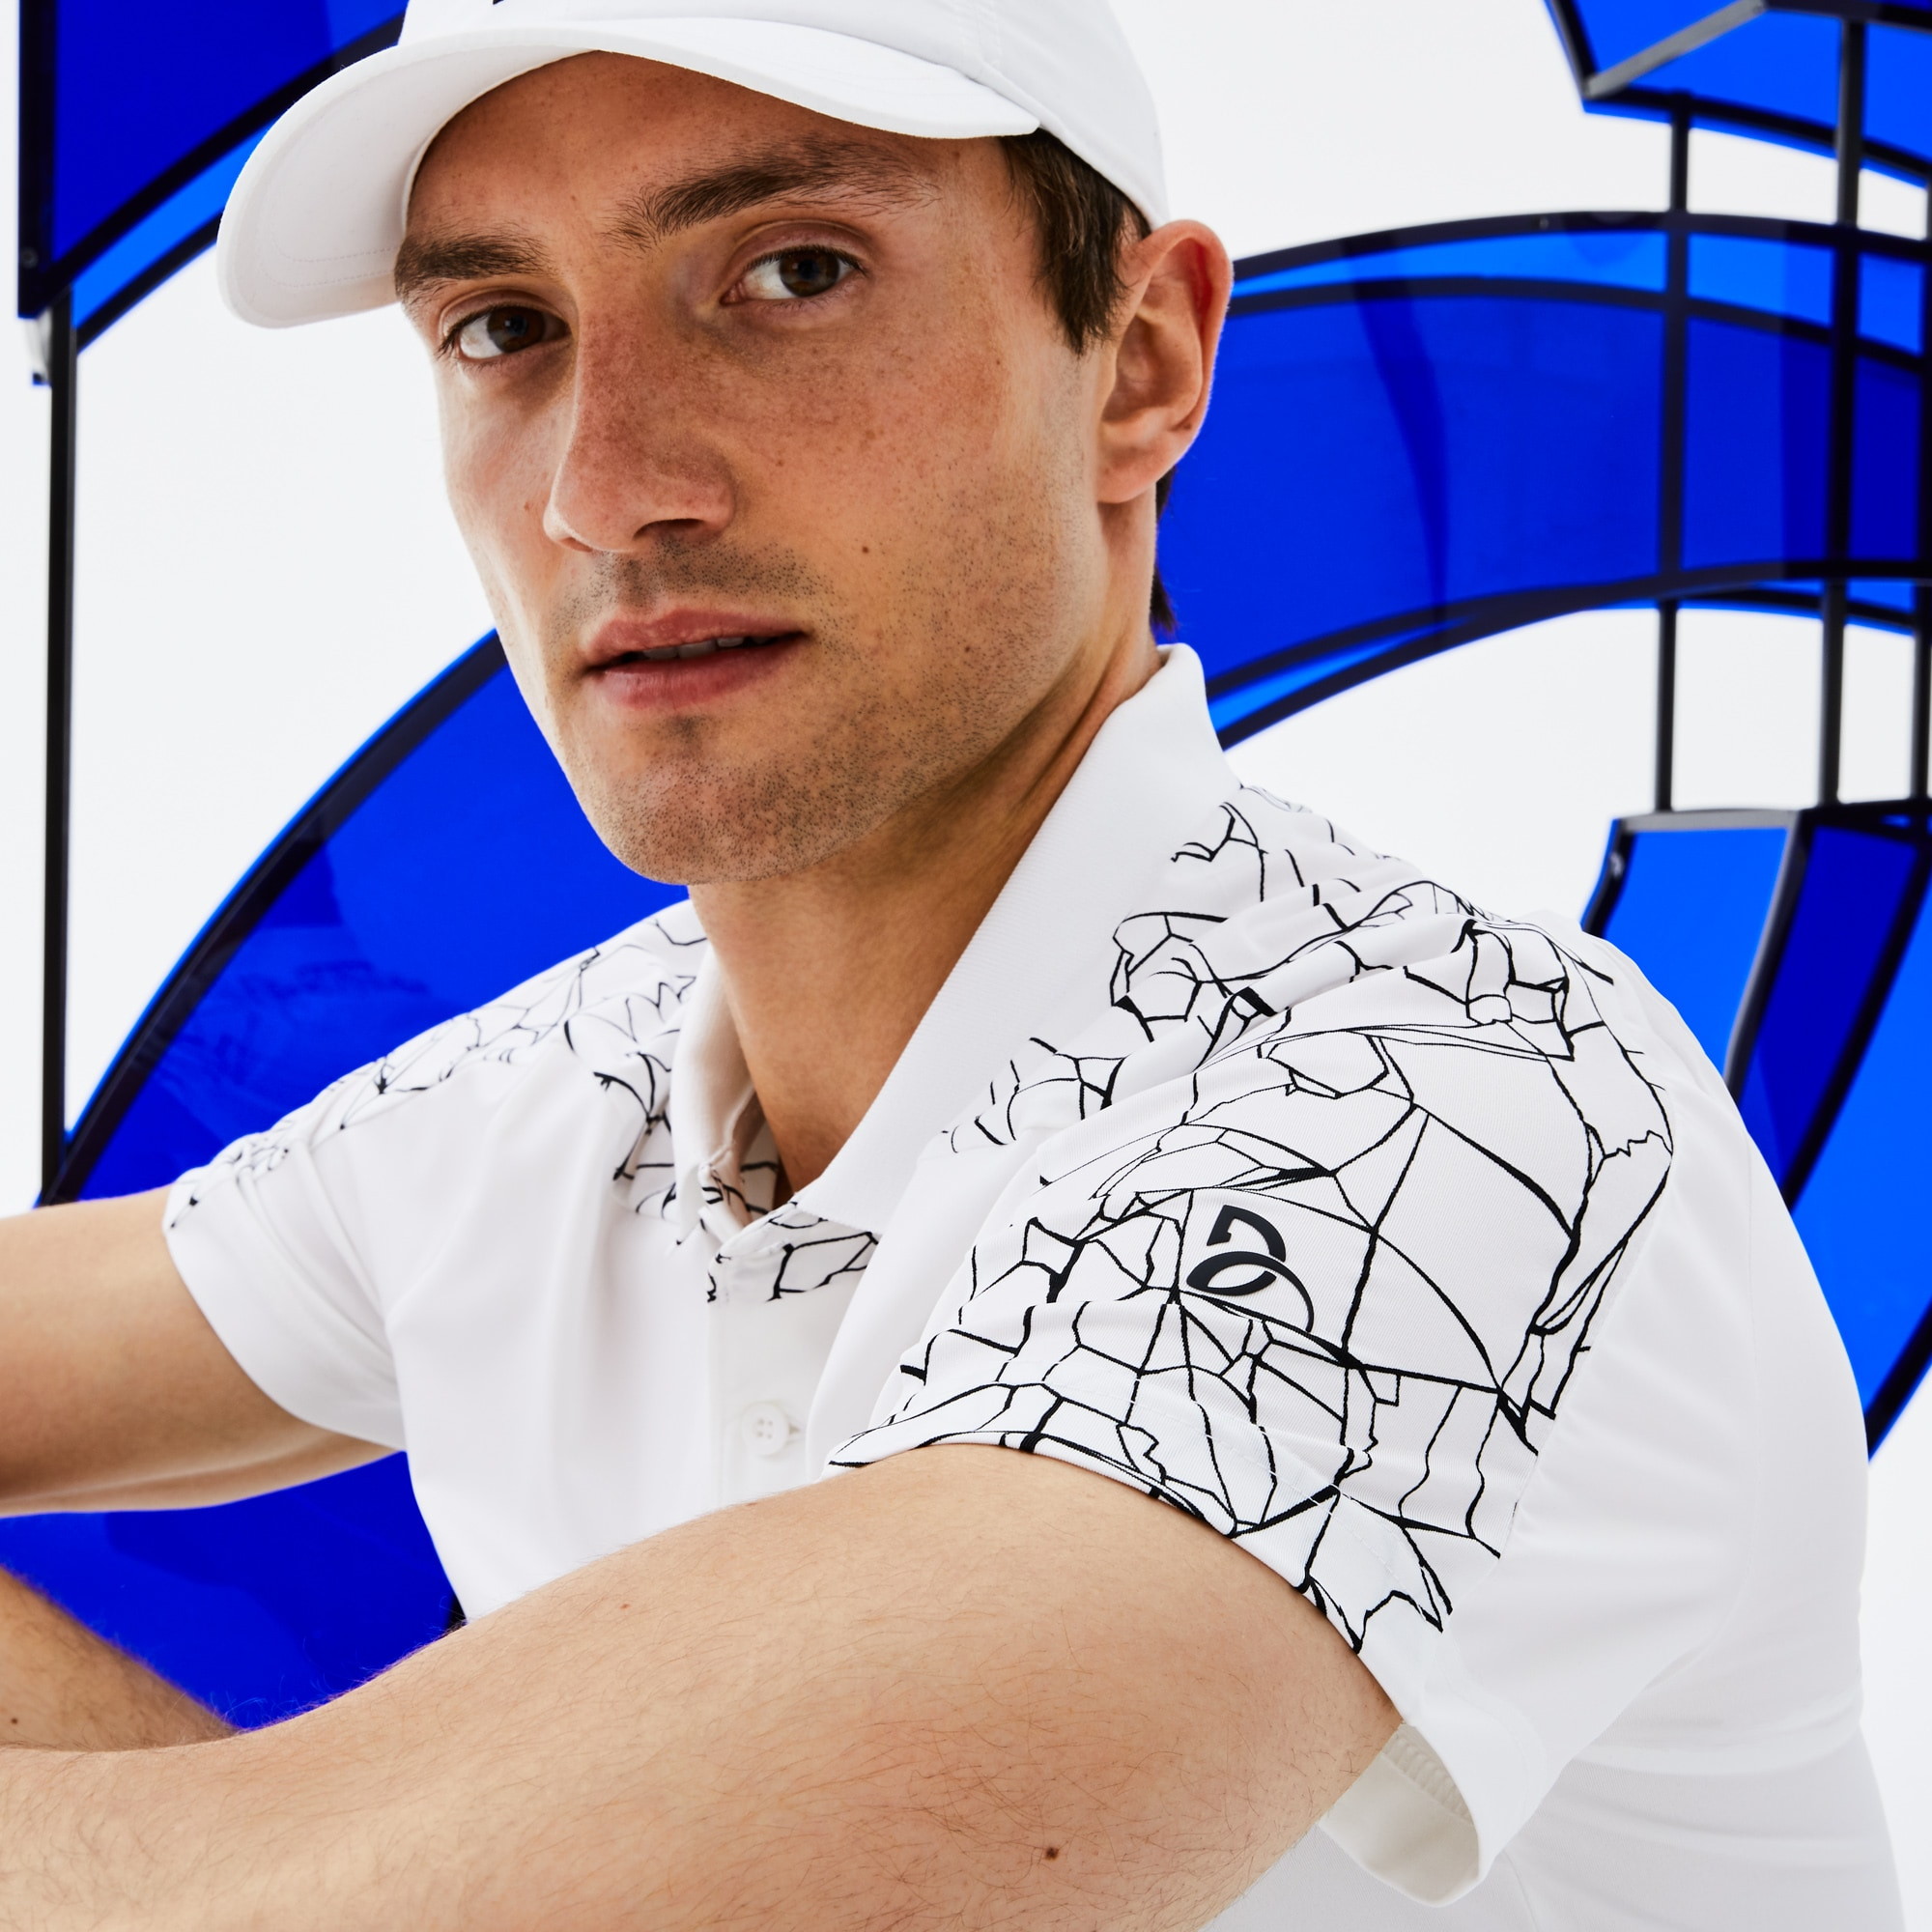 Lacoste SPORT NOVAK DJOKOVIC-ON COURT COLLECTION-polo heren technisch jersey met stretch